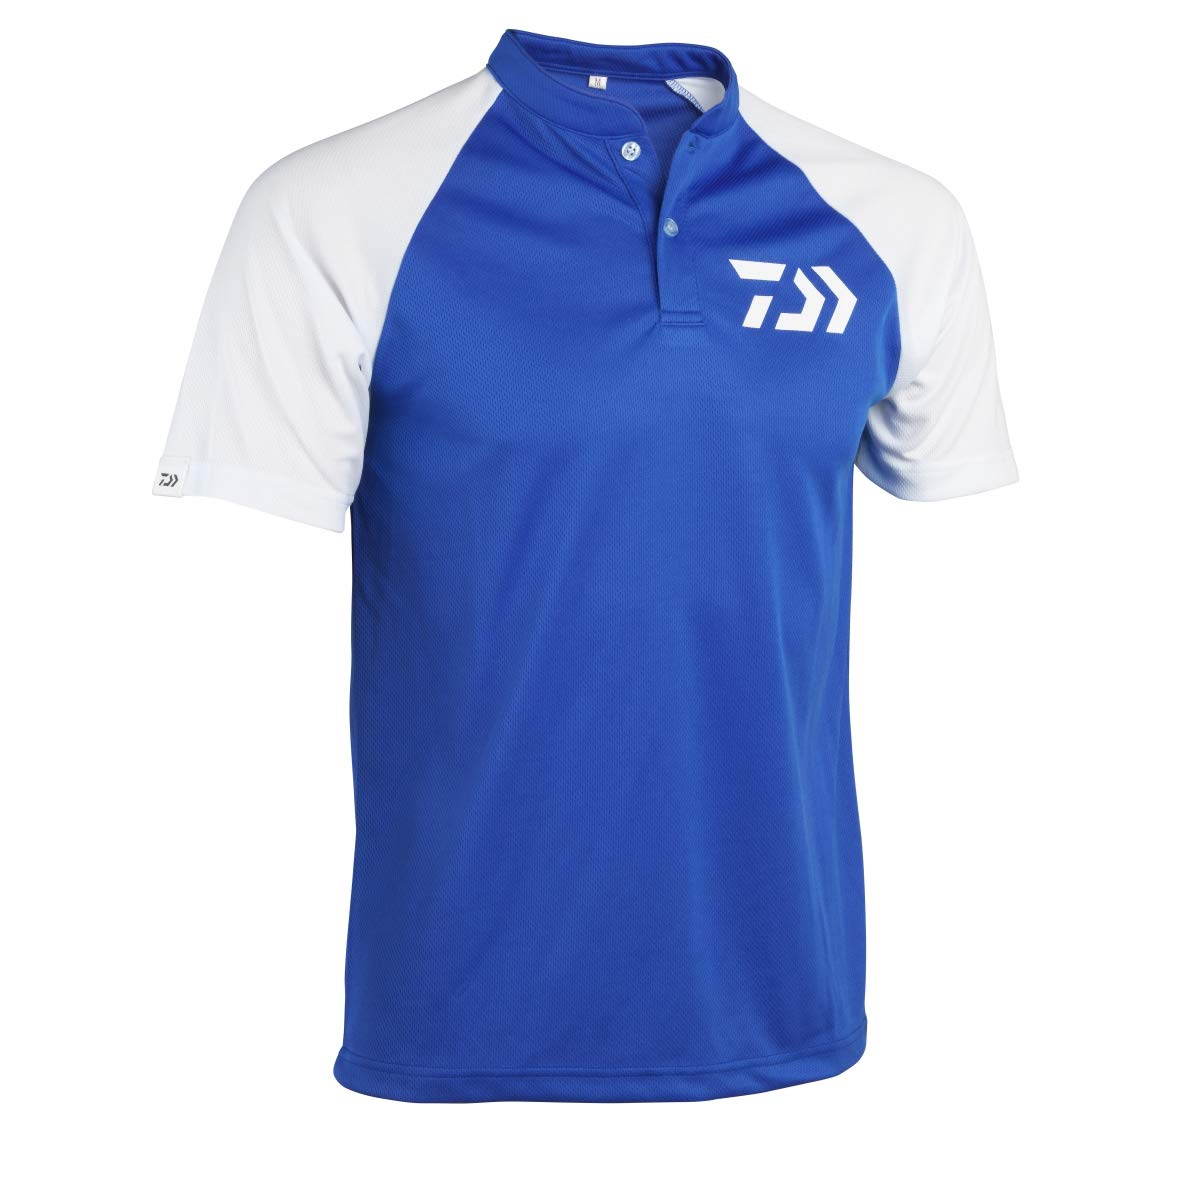 Daiwa - Polo Mao Blue White M - PMBBM: Amazon.es: Deportes y aire ...